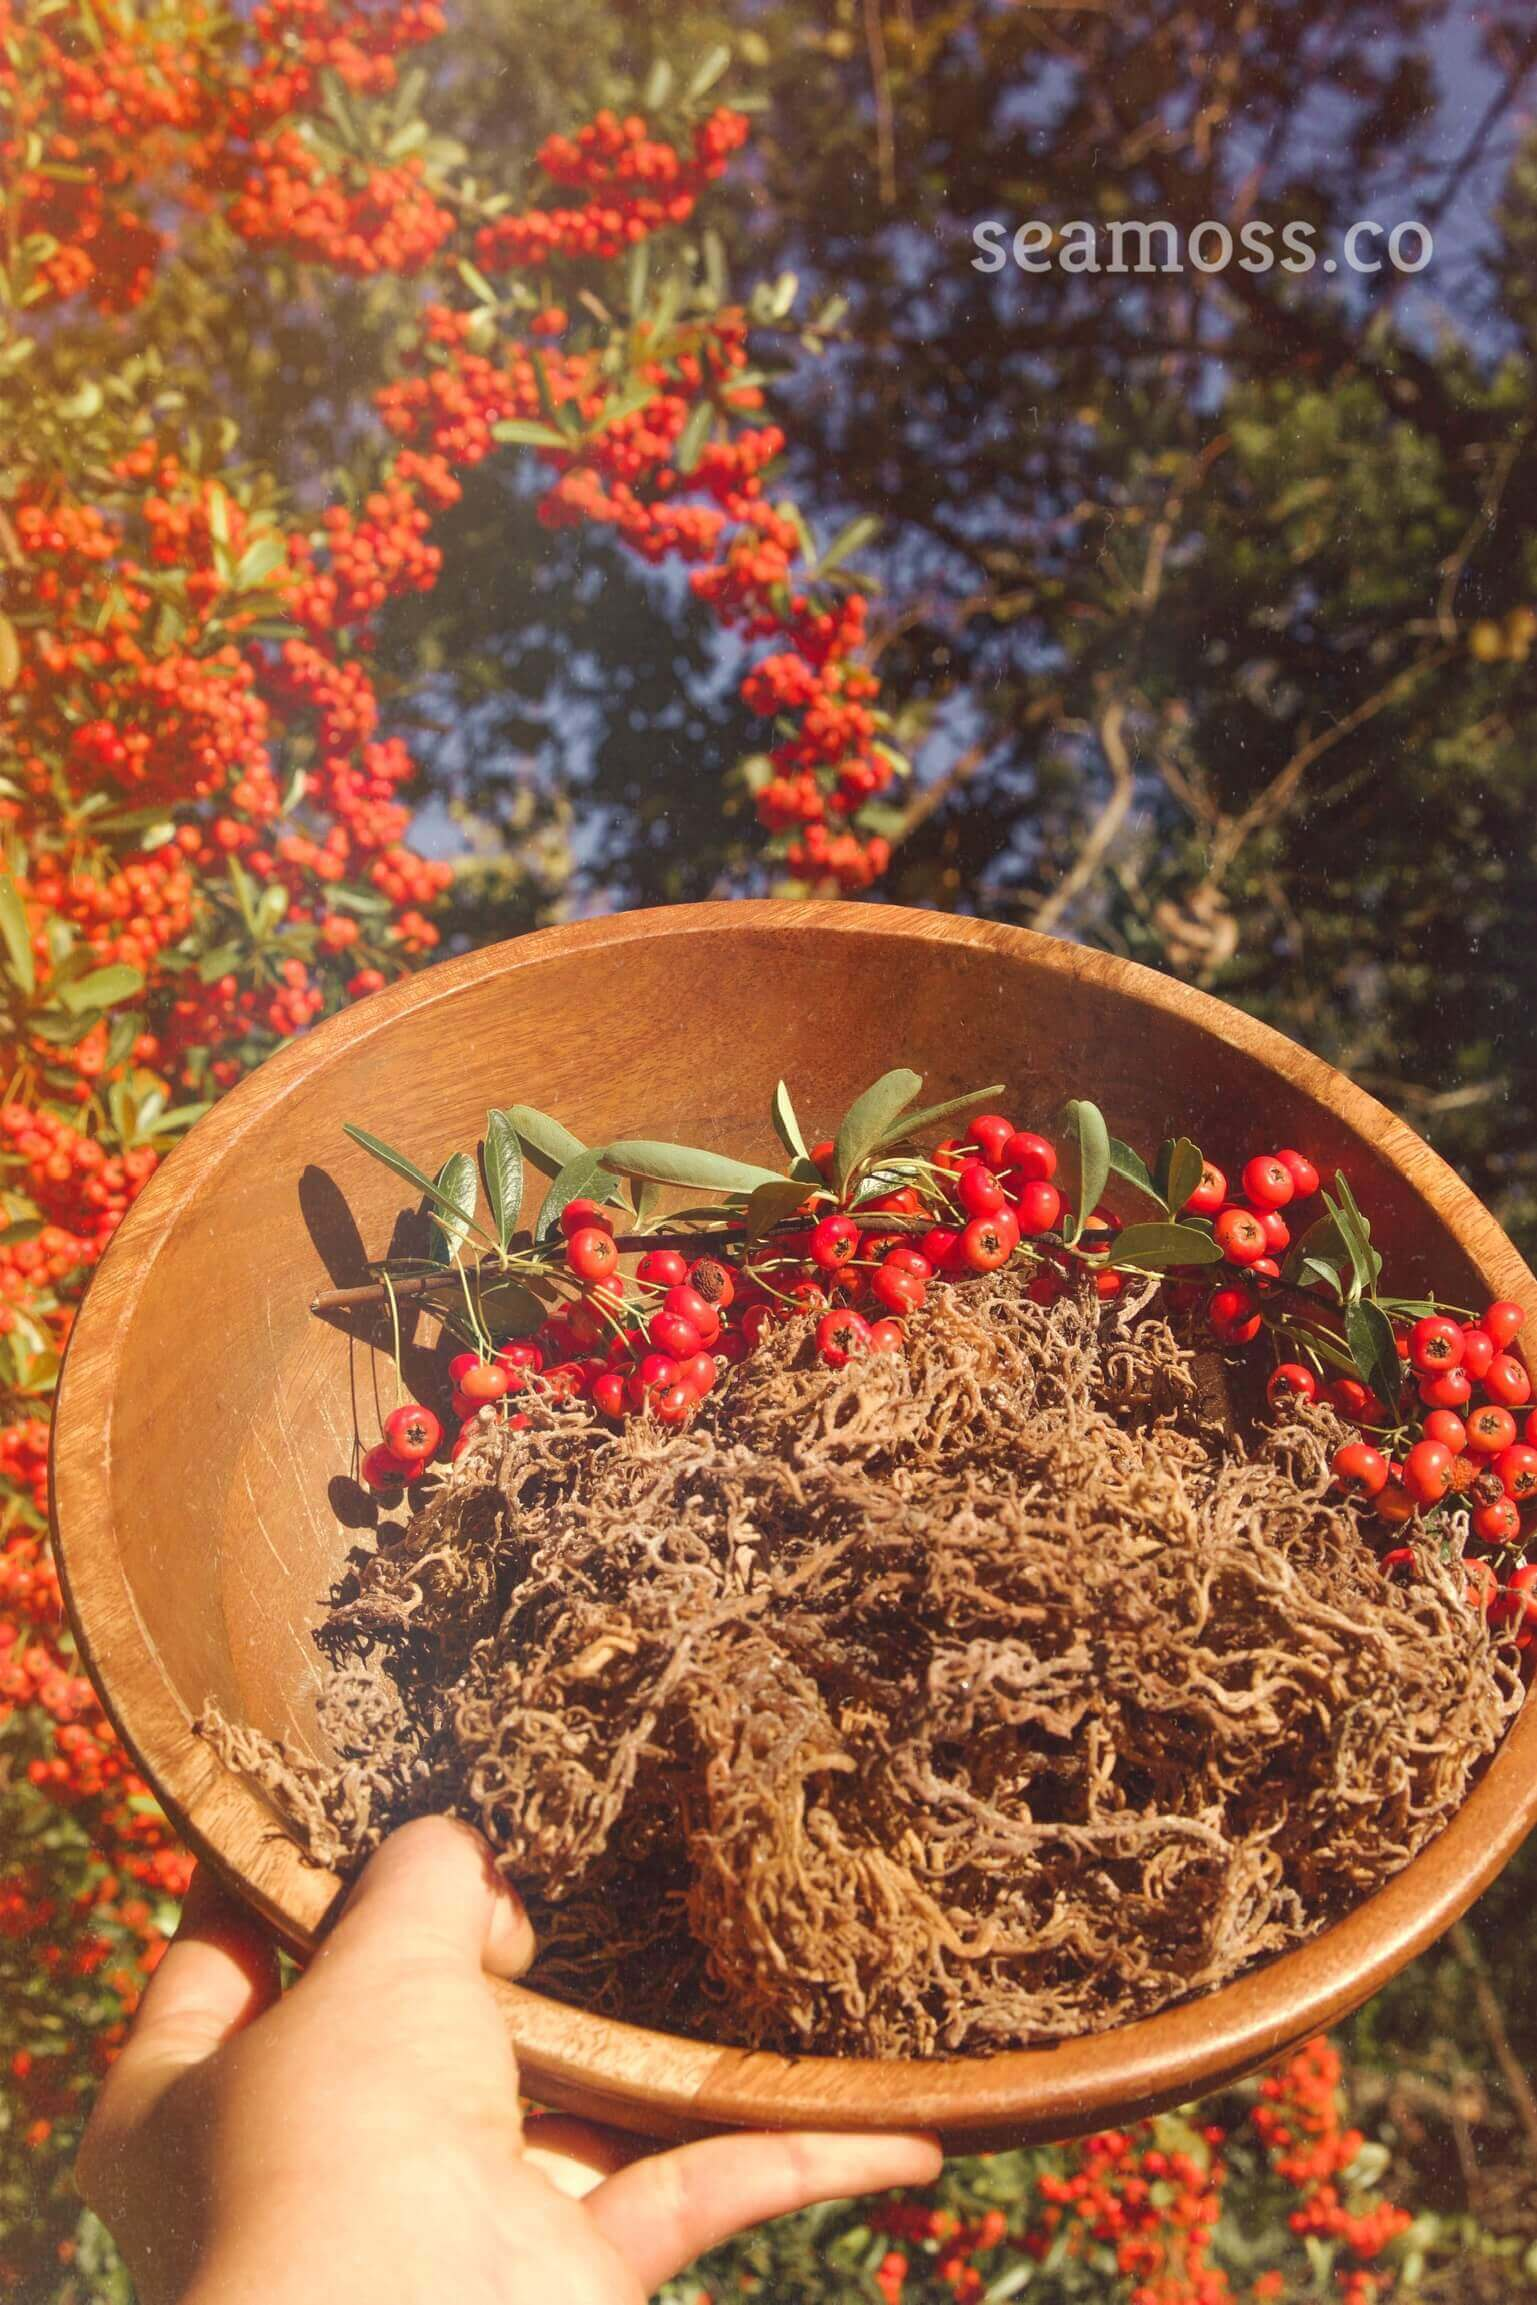 Beautiful Bowl of Sea Moss